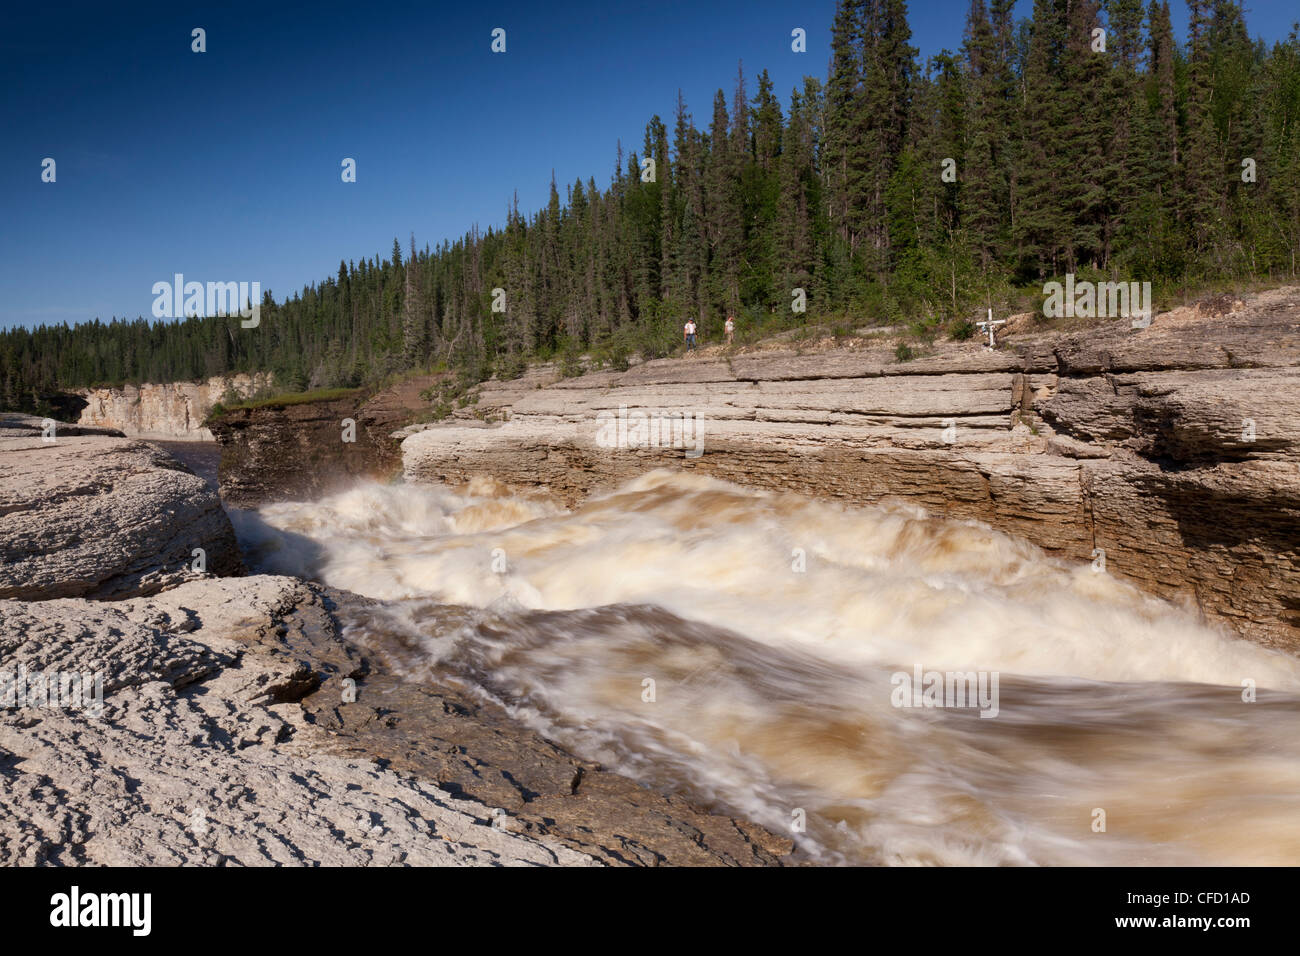 People hike along the Trout River (Sambaa Deh), Sambaa Deh Falls Territorial Park, Northwest Territories, Canada - Stock Image